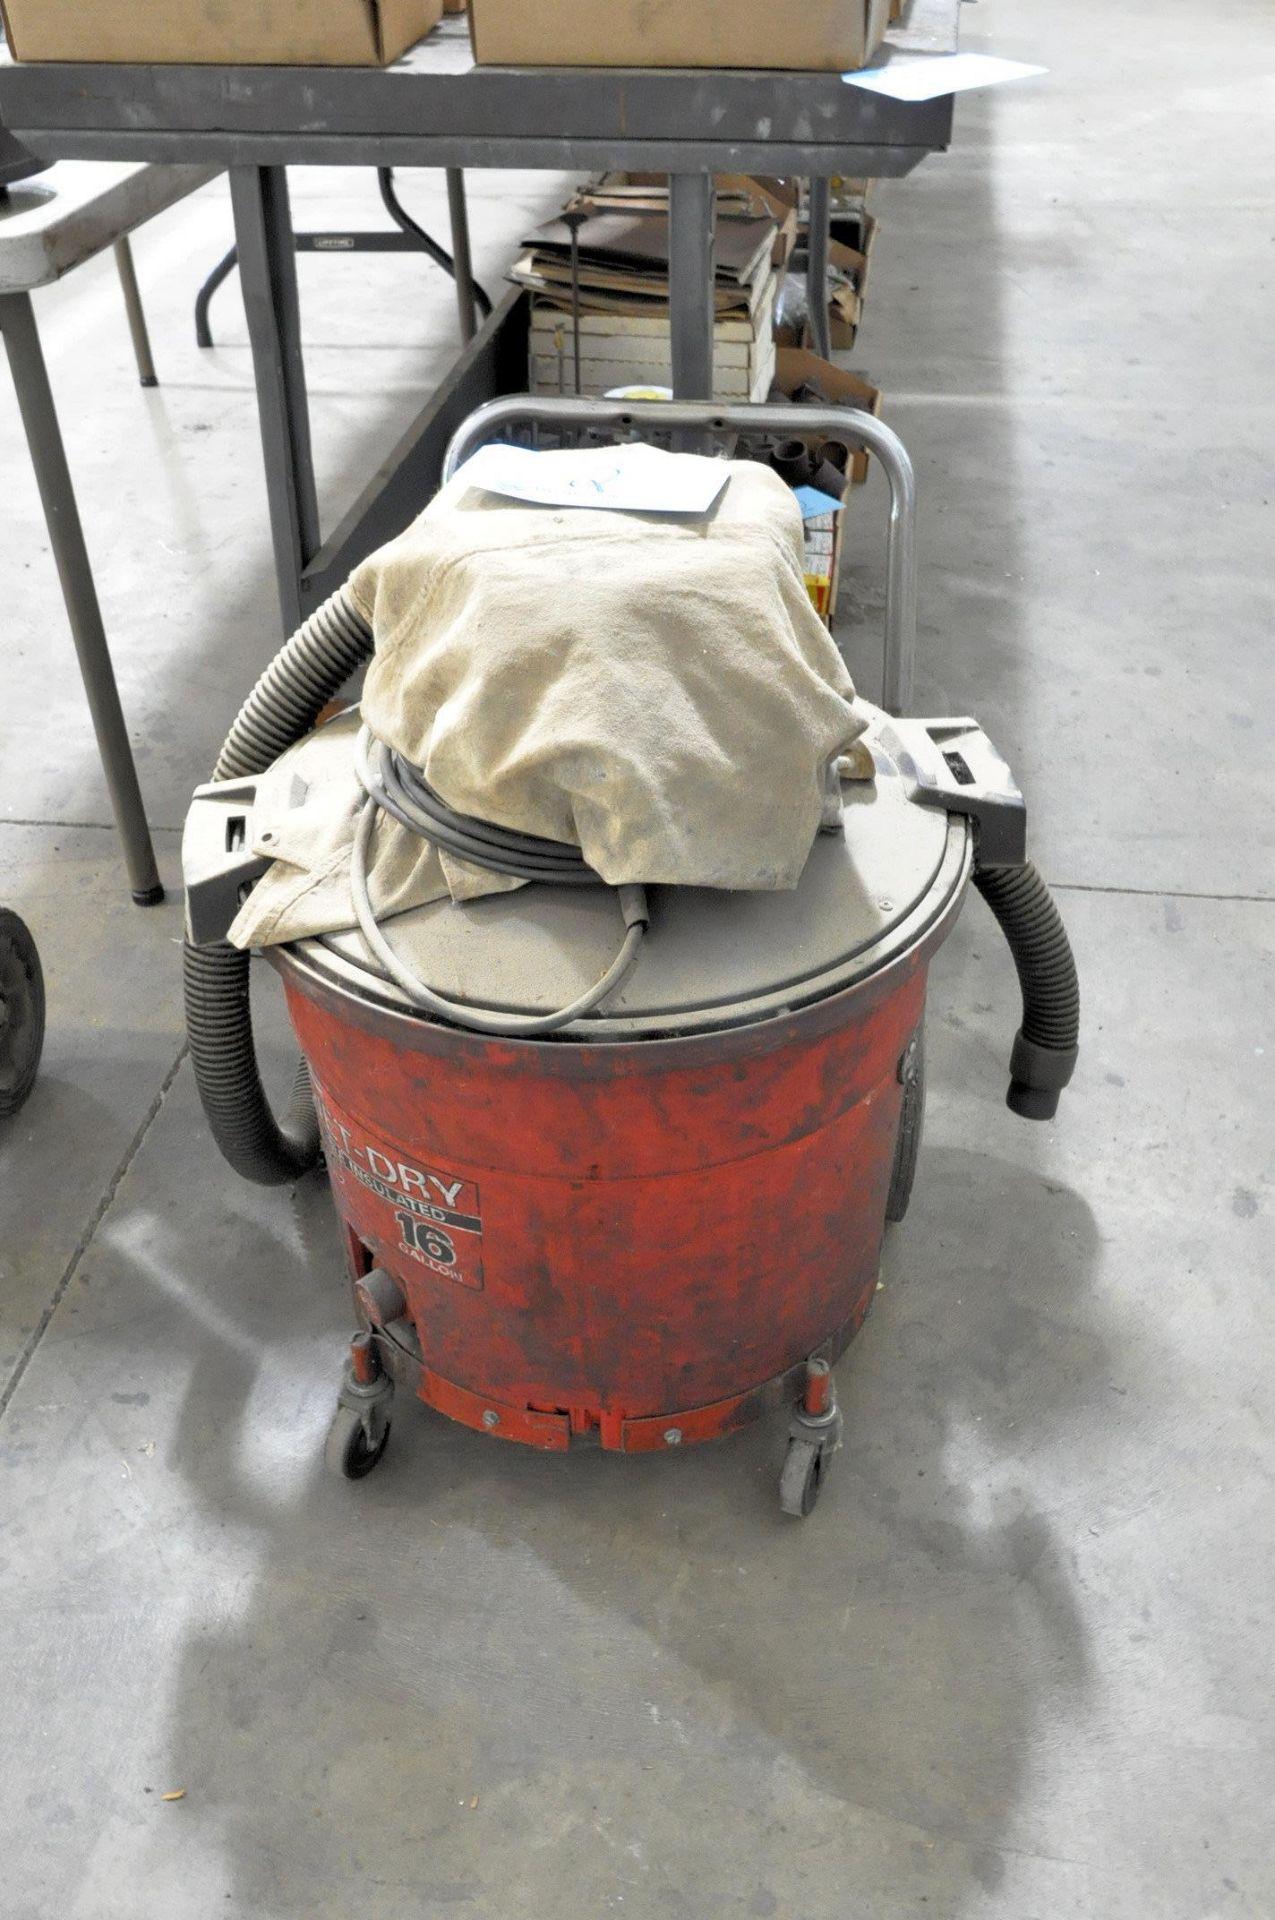 Lot 2 - SEARS CRAFTSMAN 16-Gallon Wet/Dry Vacuum